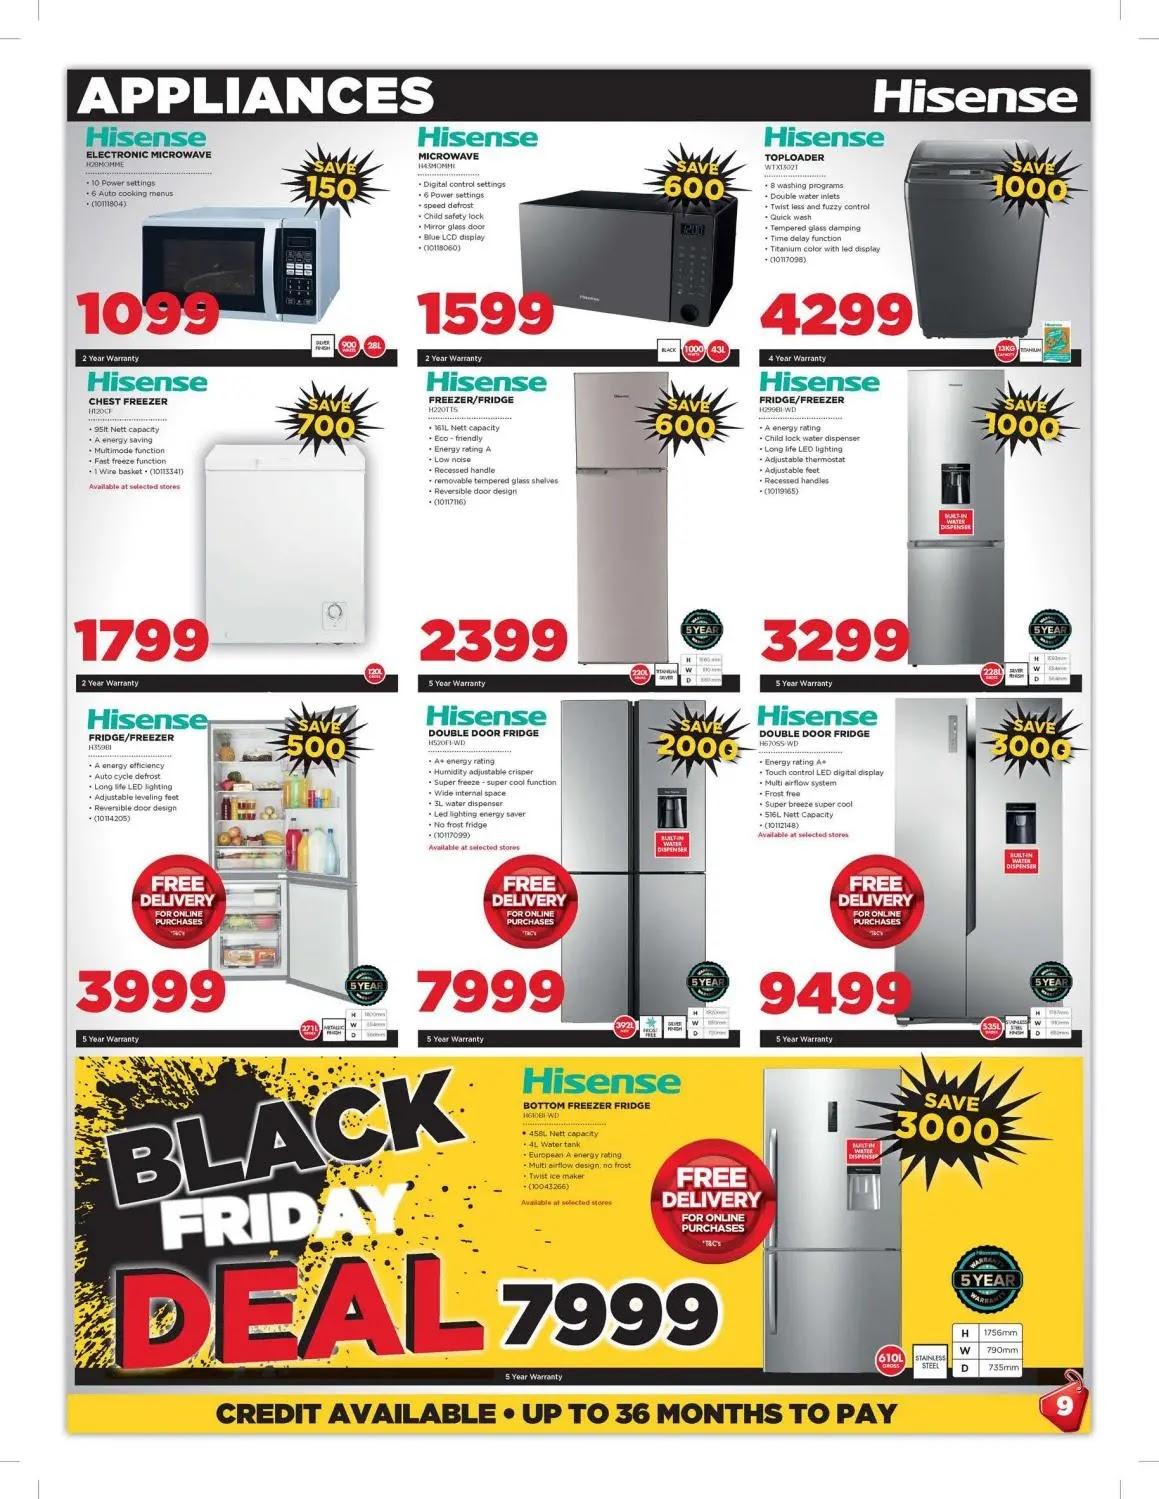 HiFi Corporation Black Friday Deals  Page 9